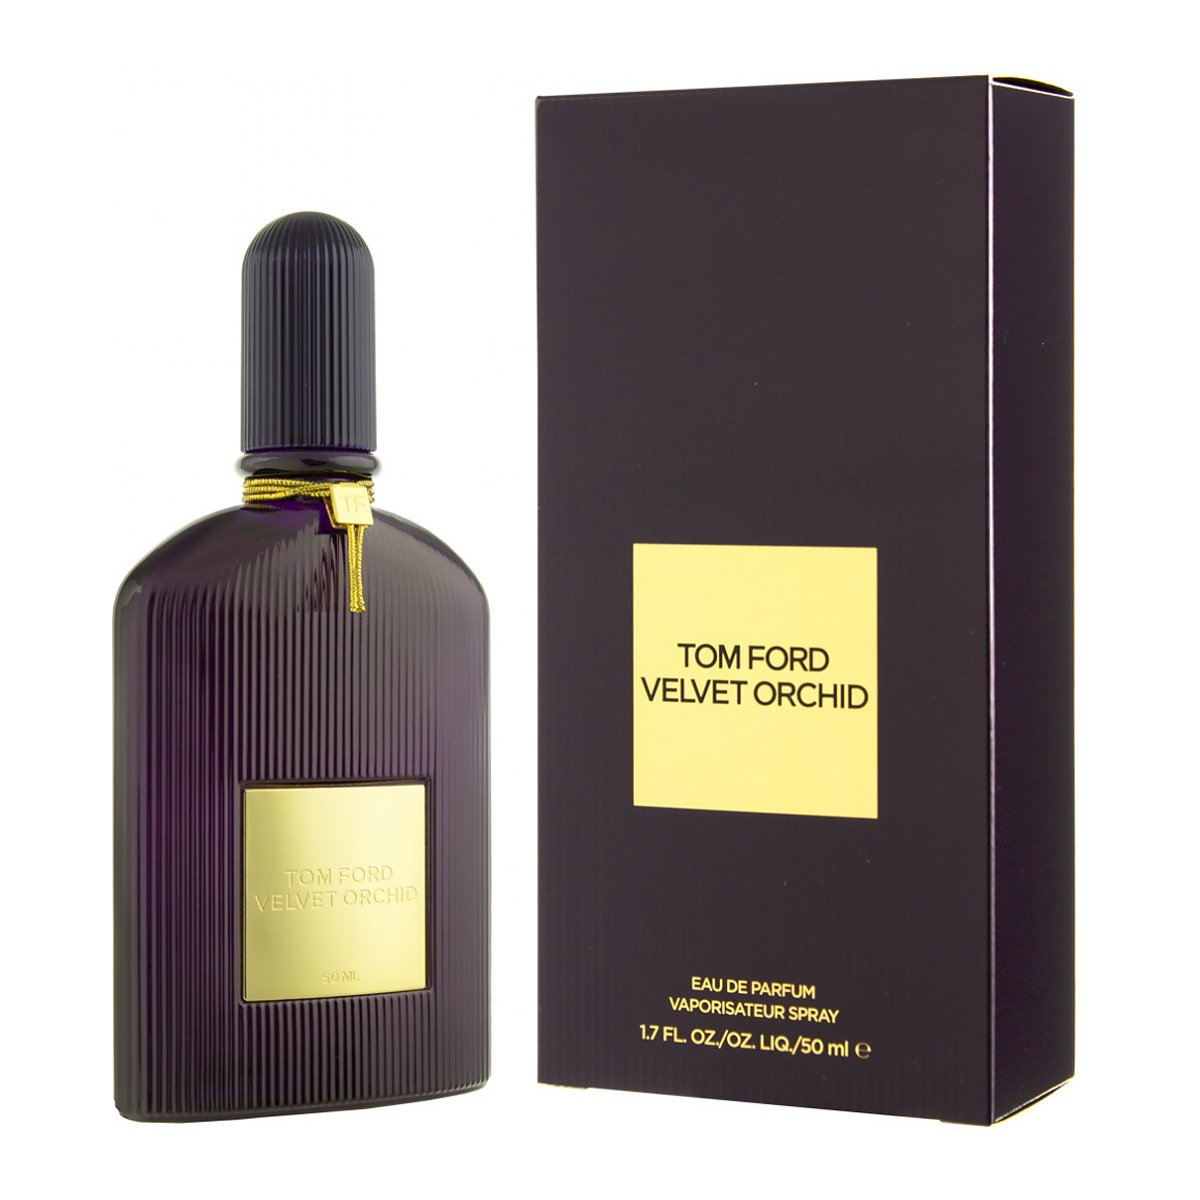 Tom Ford - Velvet Orchid 8bae5a0caae